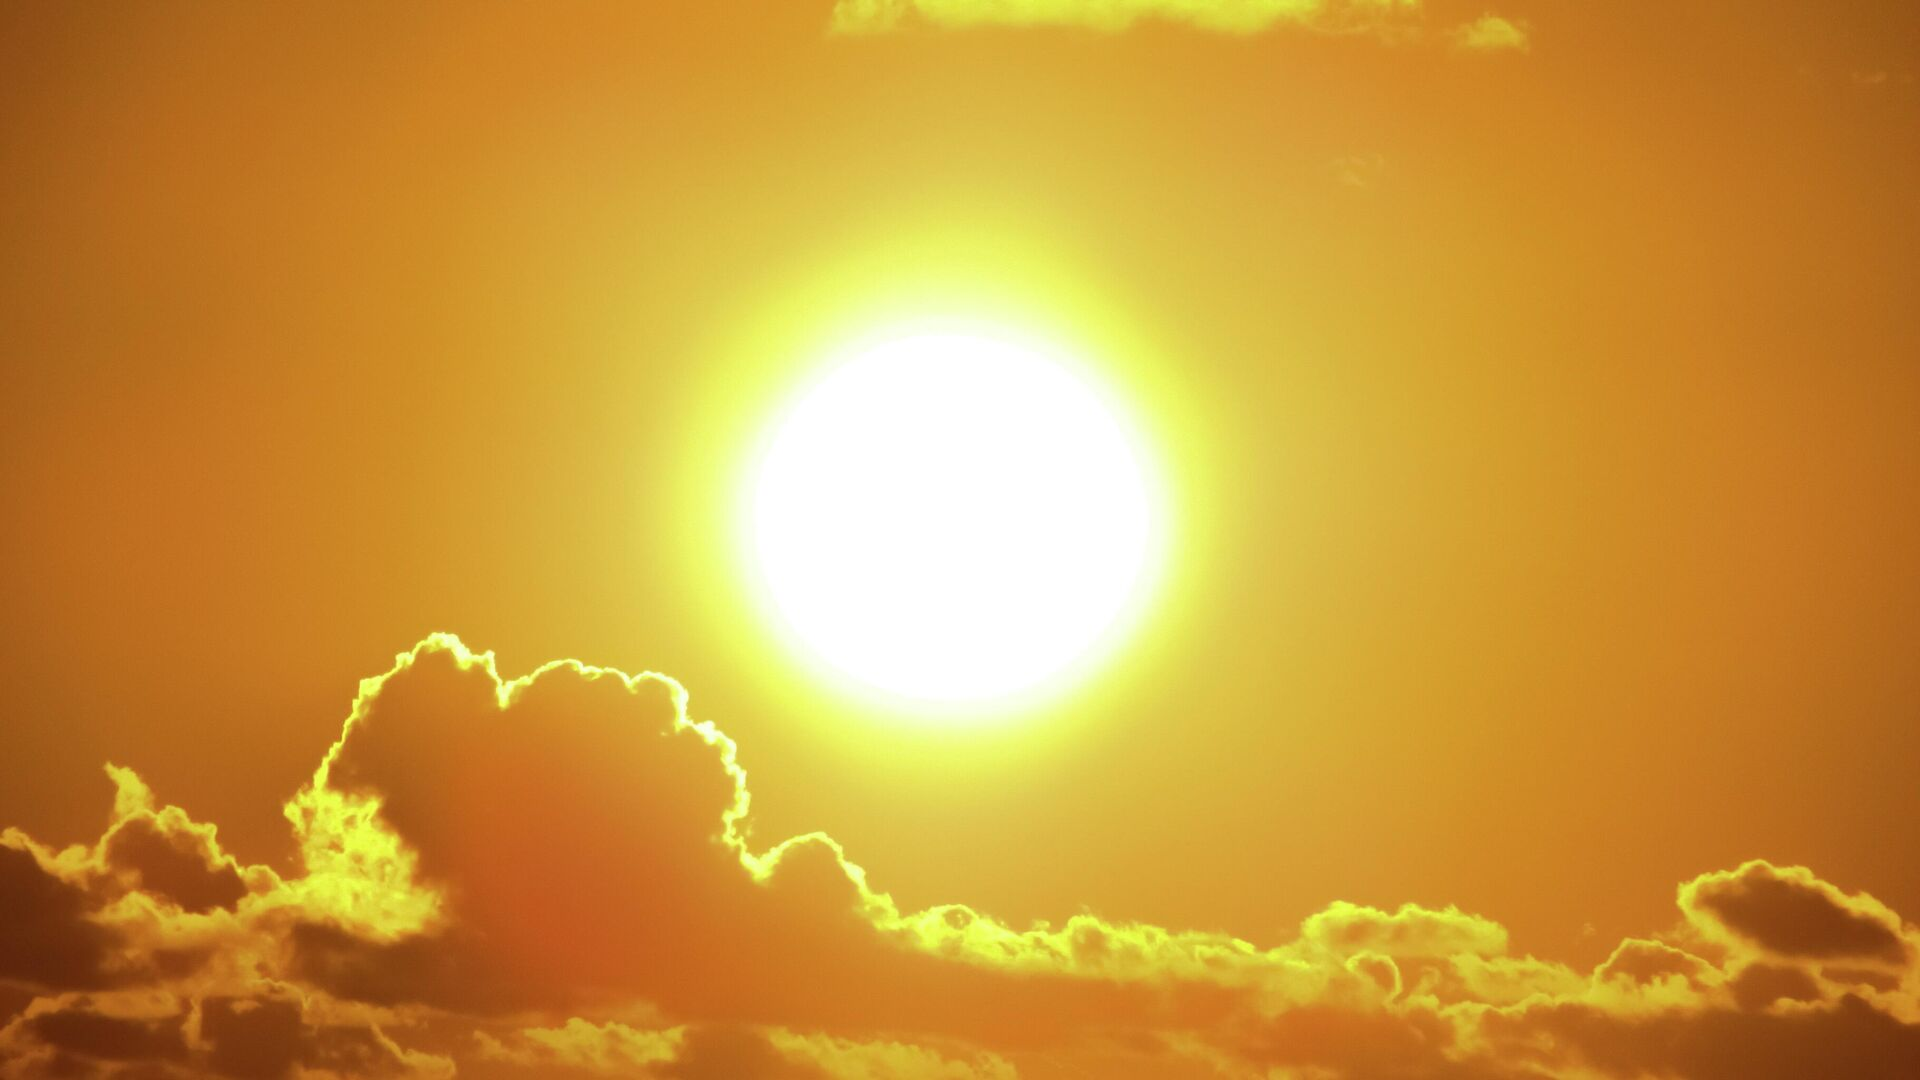 Яркое солнце в облаках - Sputnik Узбекистан, 1920, 17.09.2021